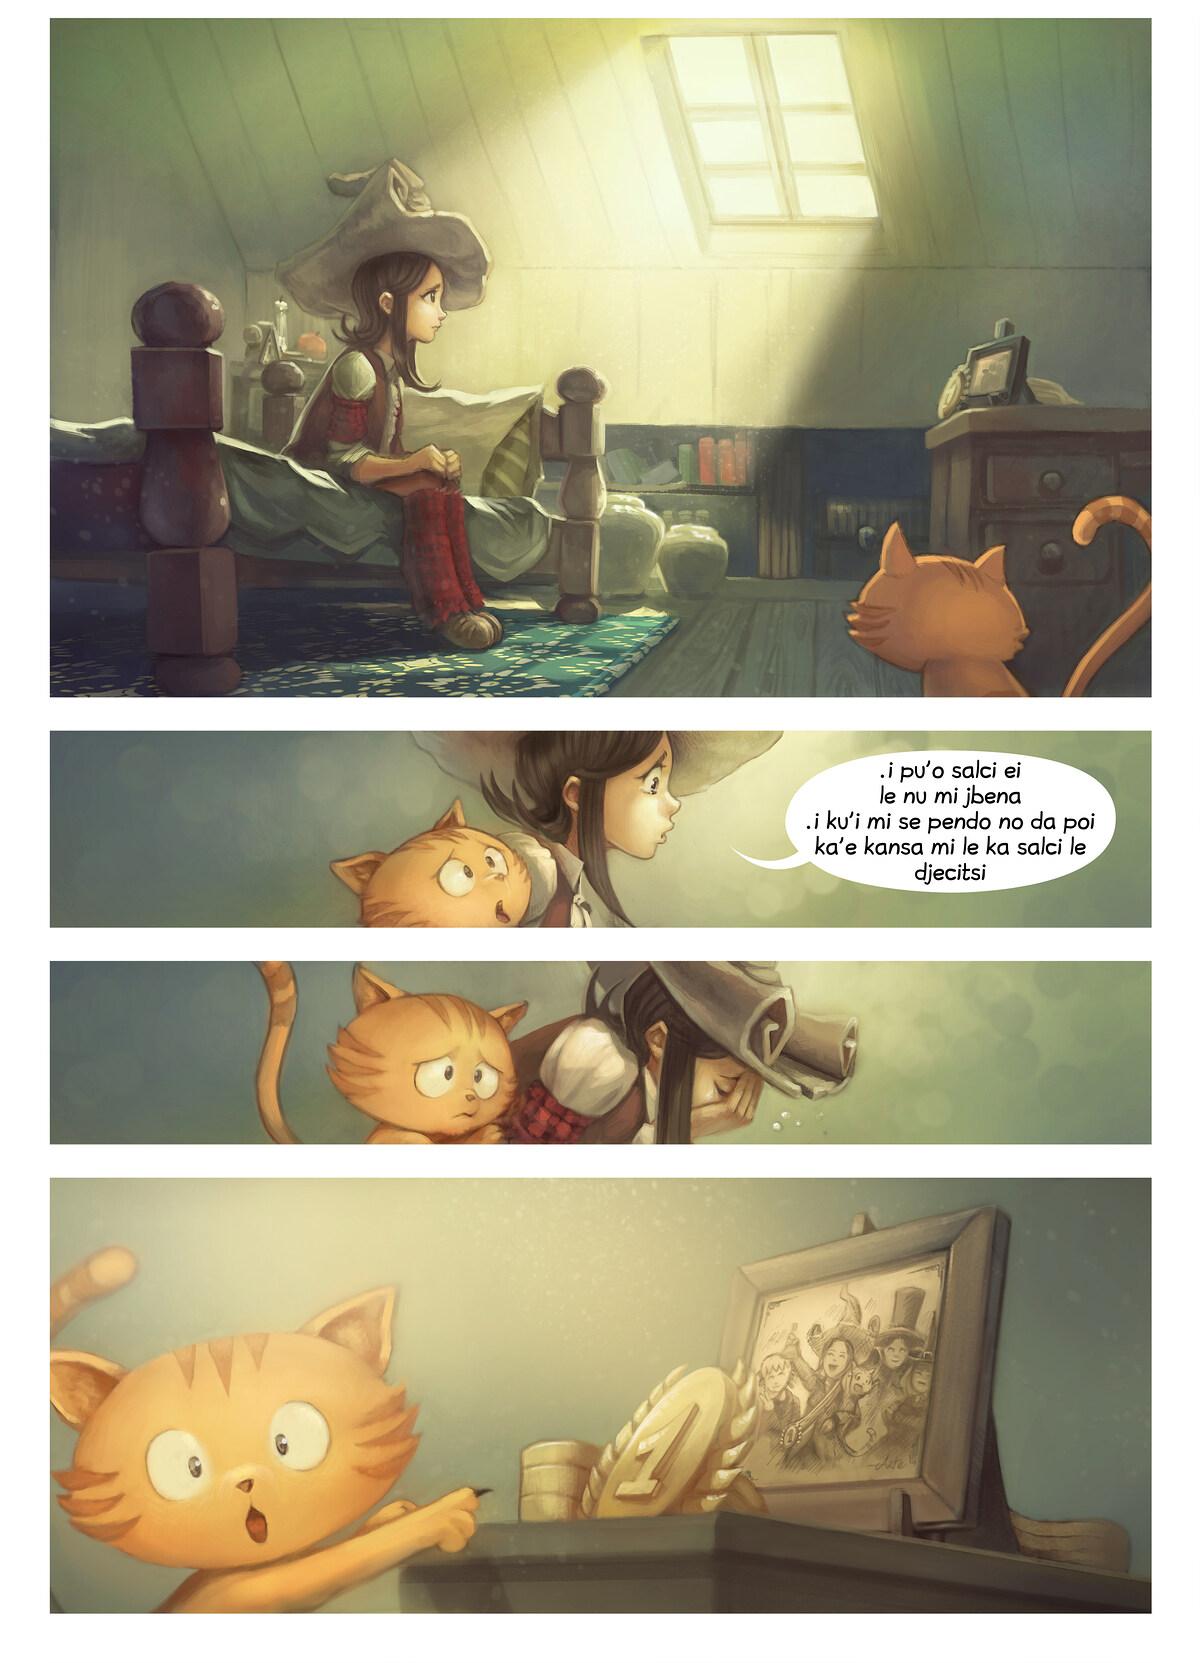 A webcomic page of Pepper&Carrot, pagbu 8 [jb], papri 1